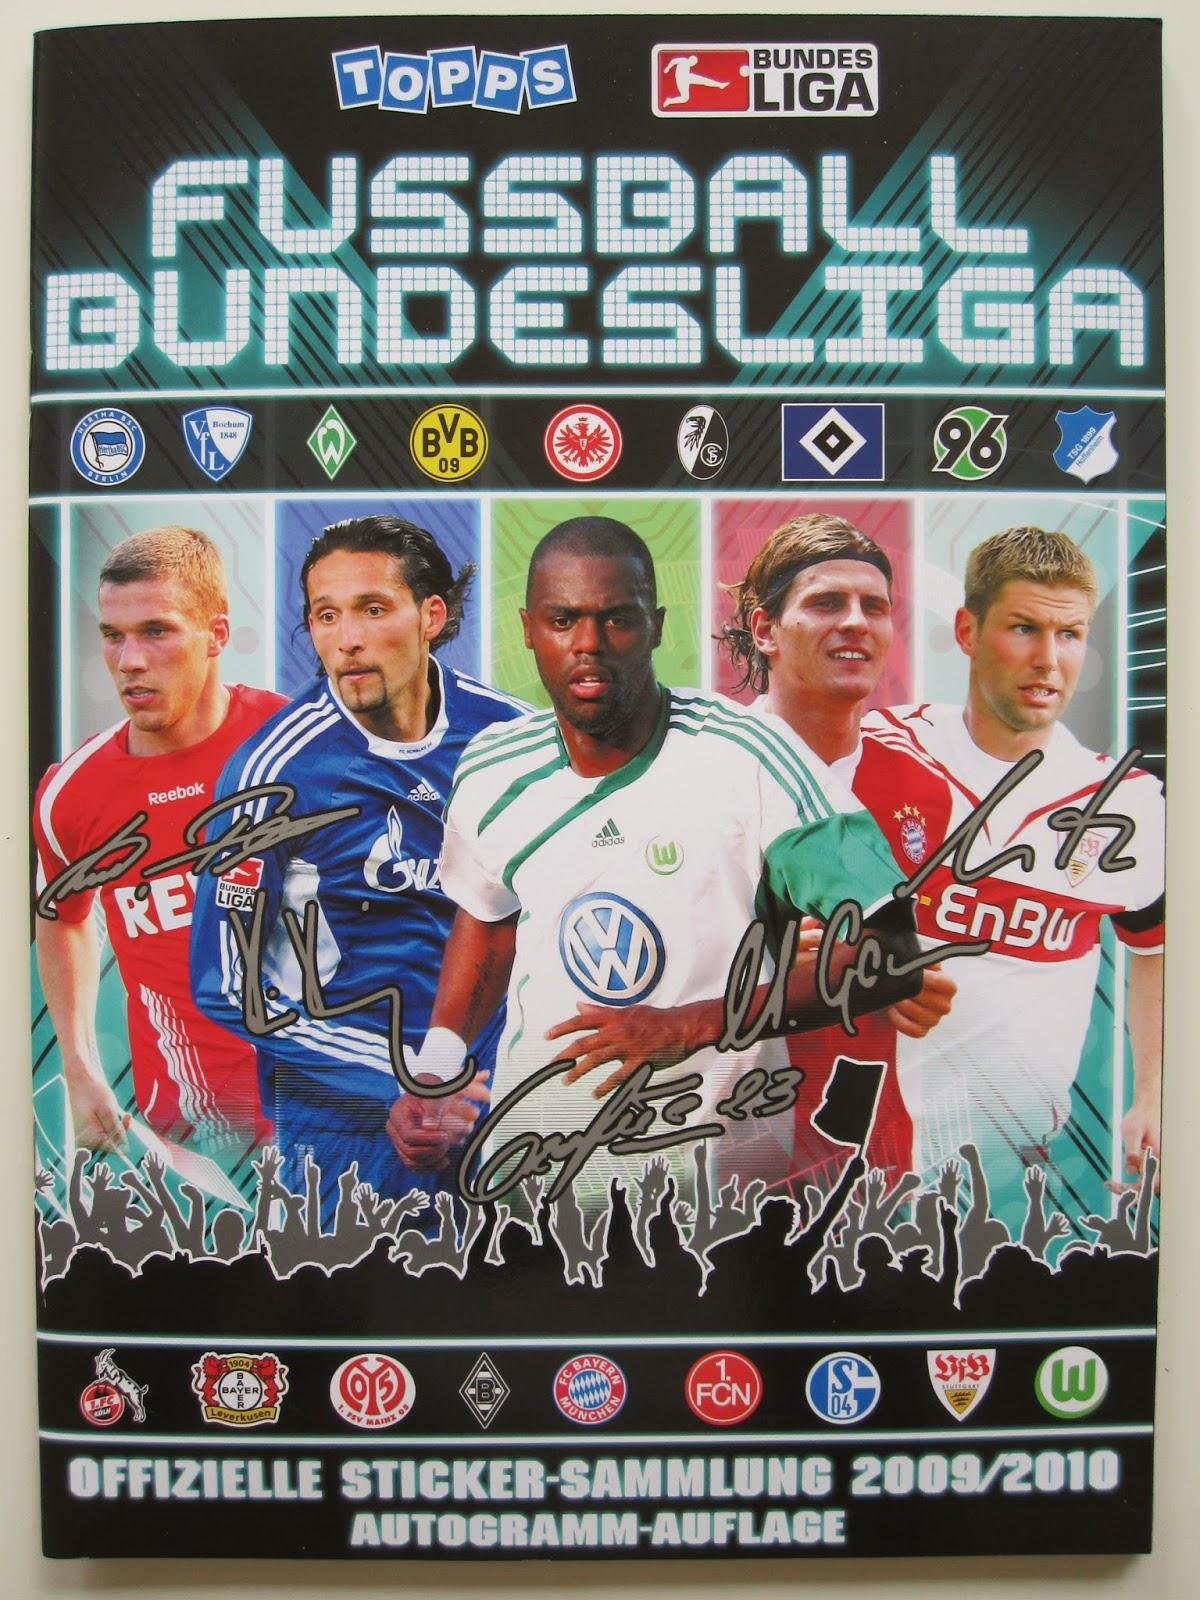 Only good stickers topps bundesliga 2010 for Bundesliga 2010